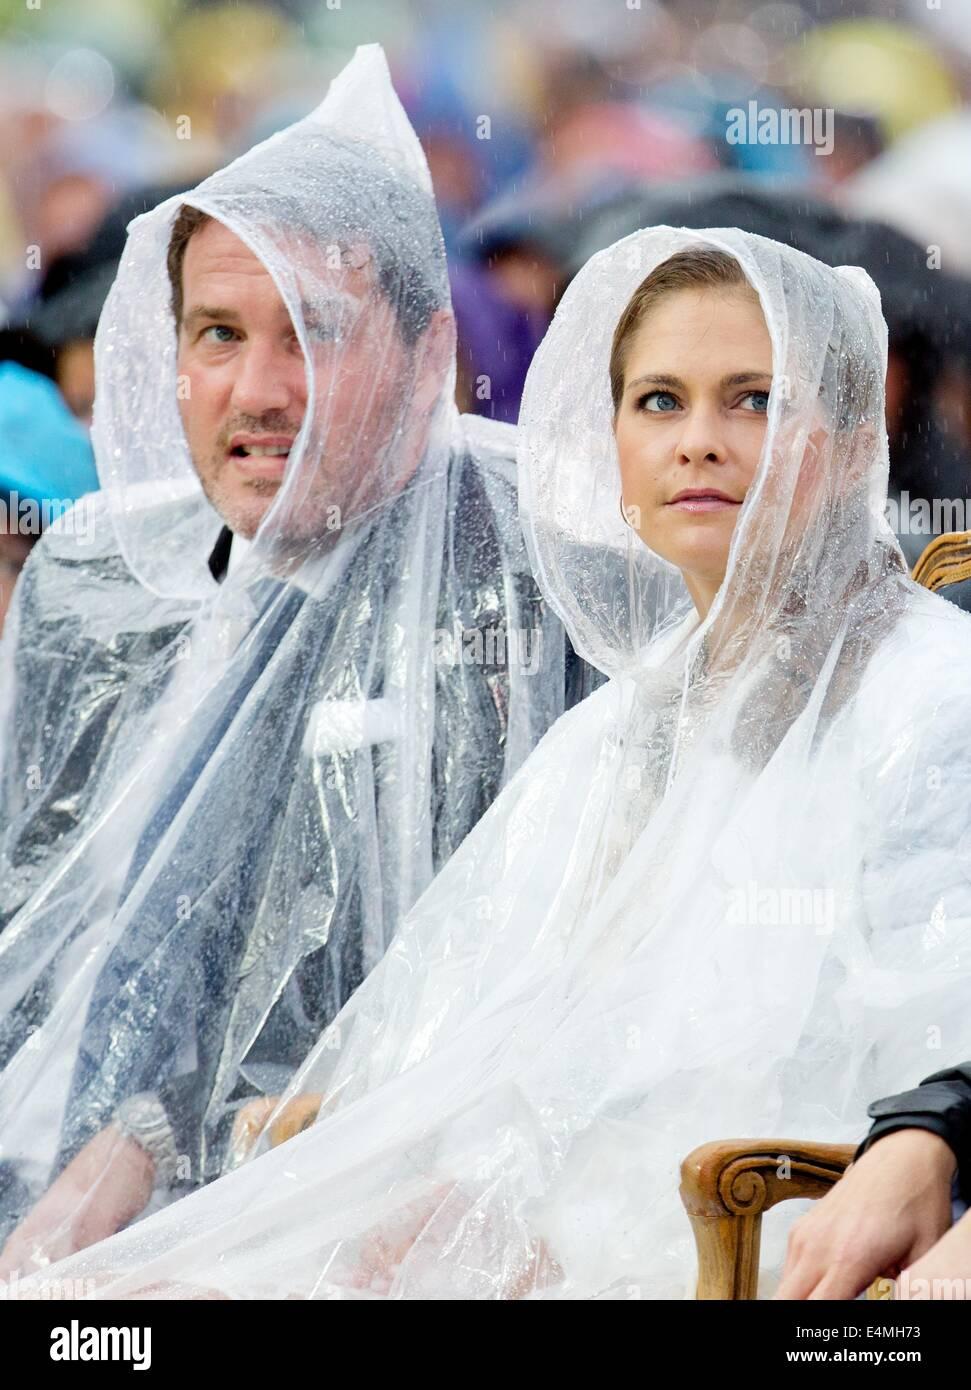 Borgholm, Sweden. 14th July, 2014. Princess Madeleine and Chris ...